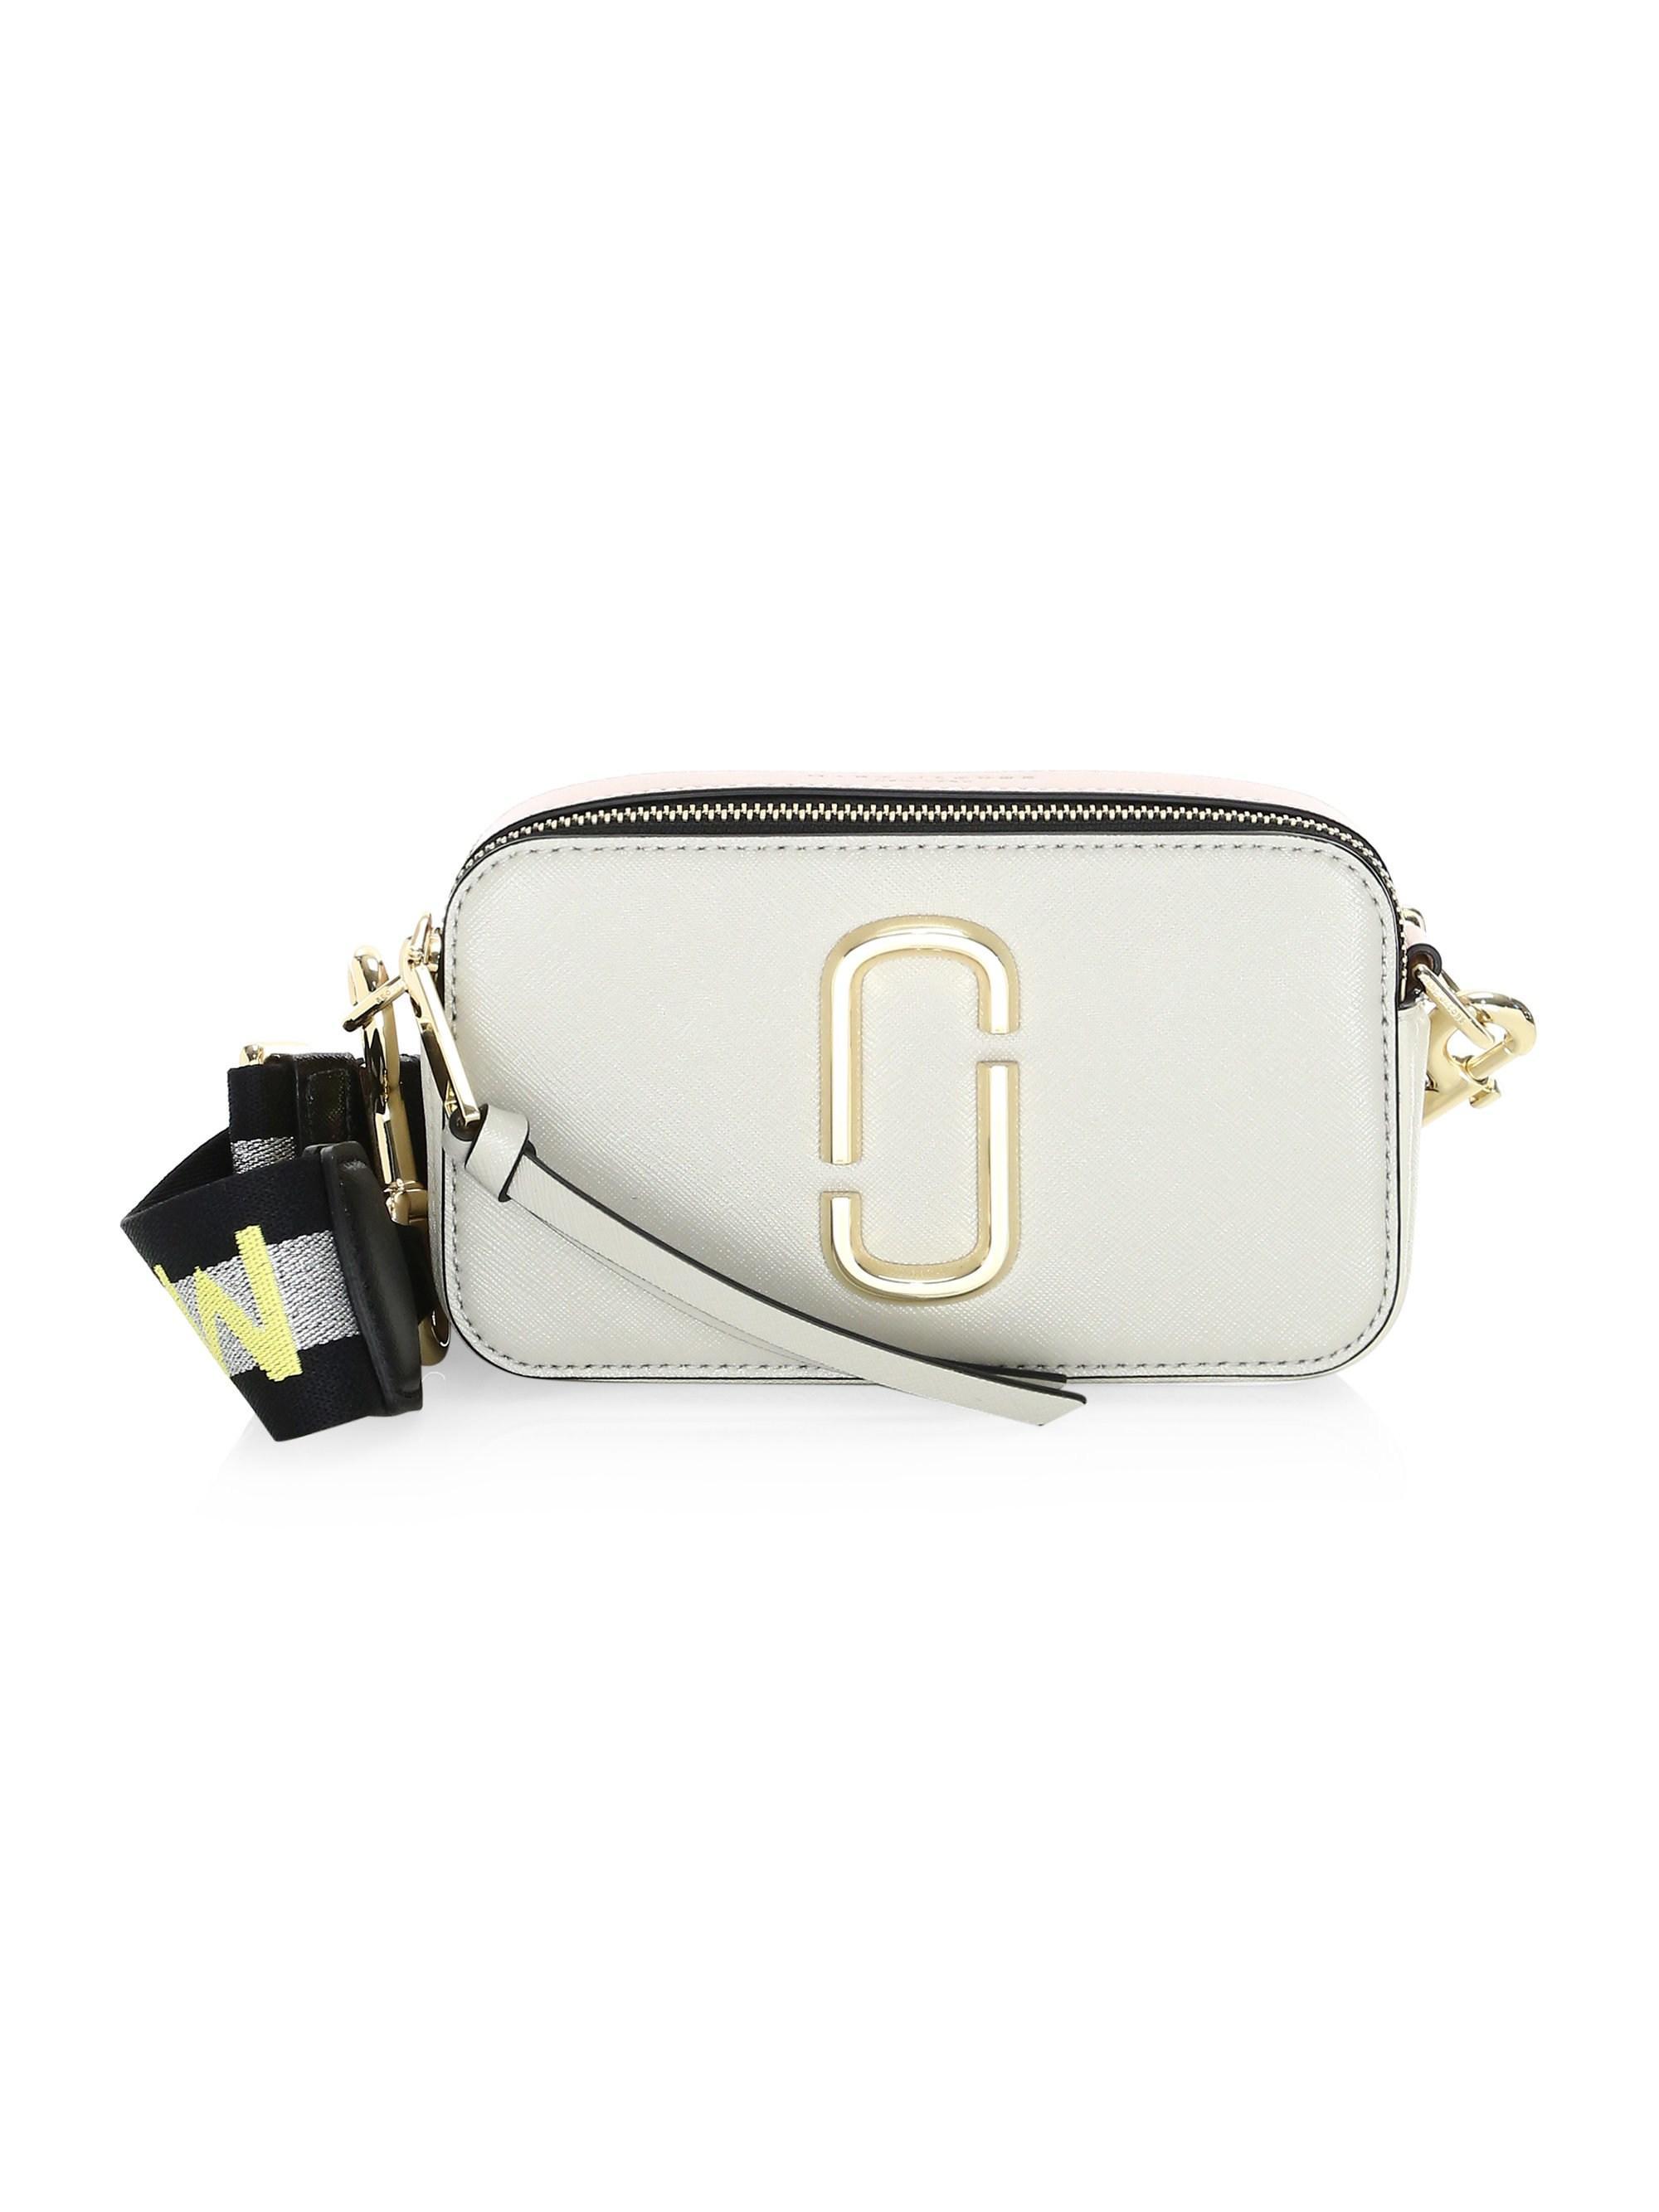 6dc8f0f6ea3 Lyst - Marc Jacobs Women's Snapshot Leather Crossbody Bag - Blue Sea